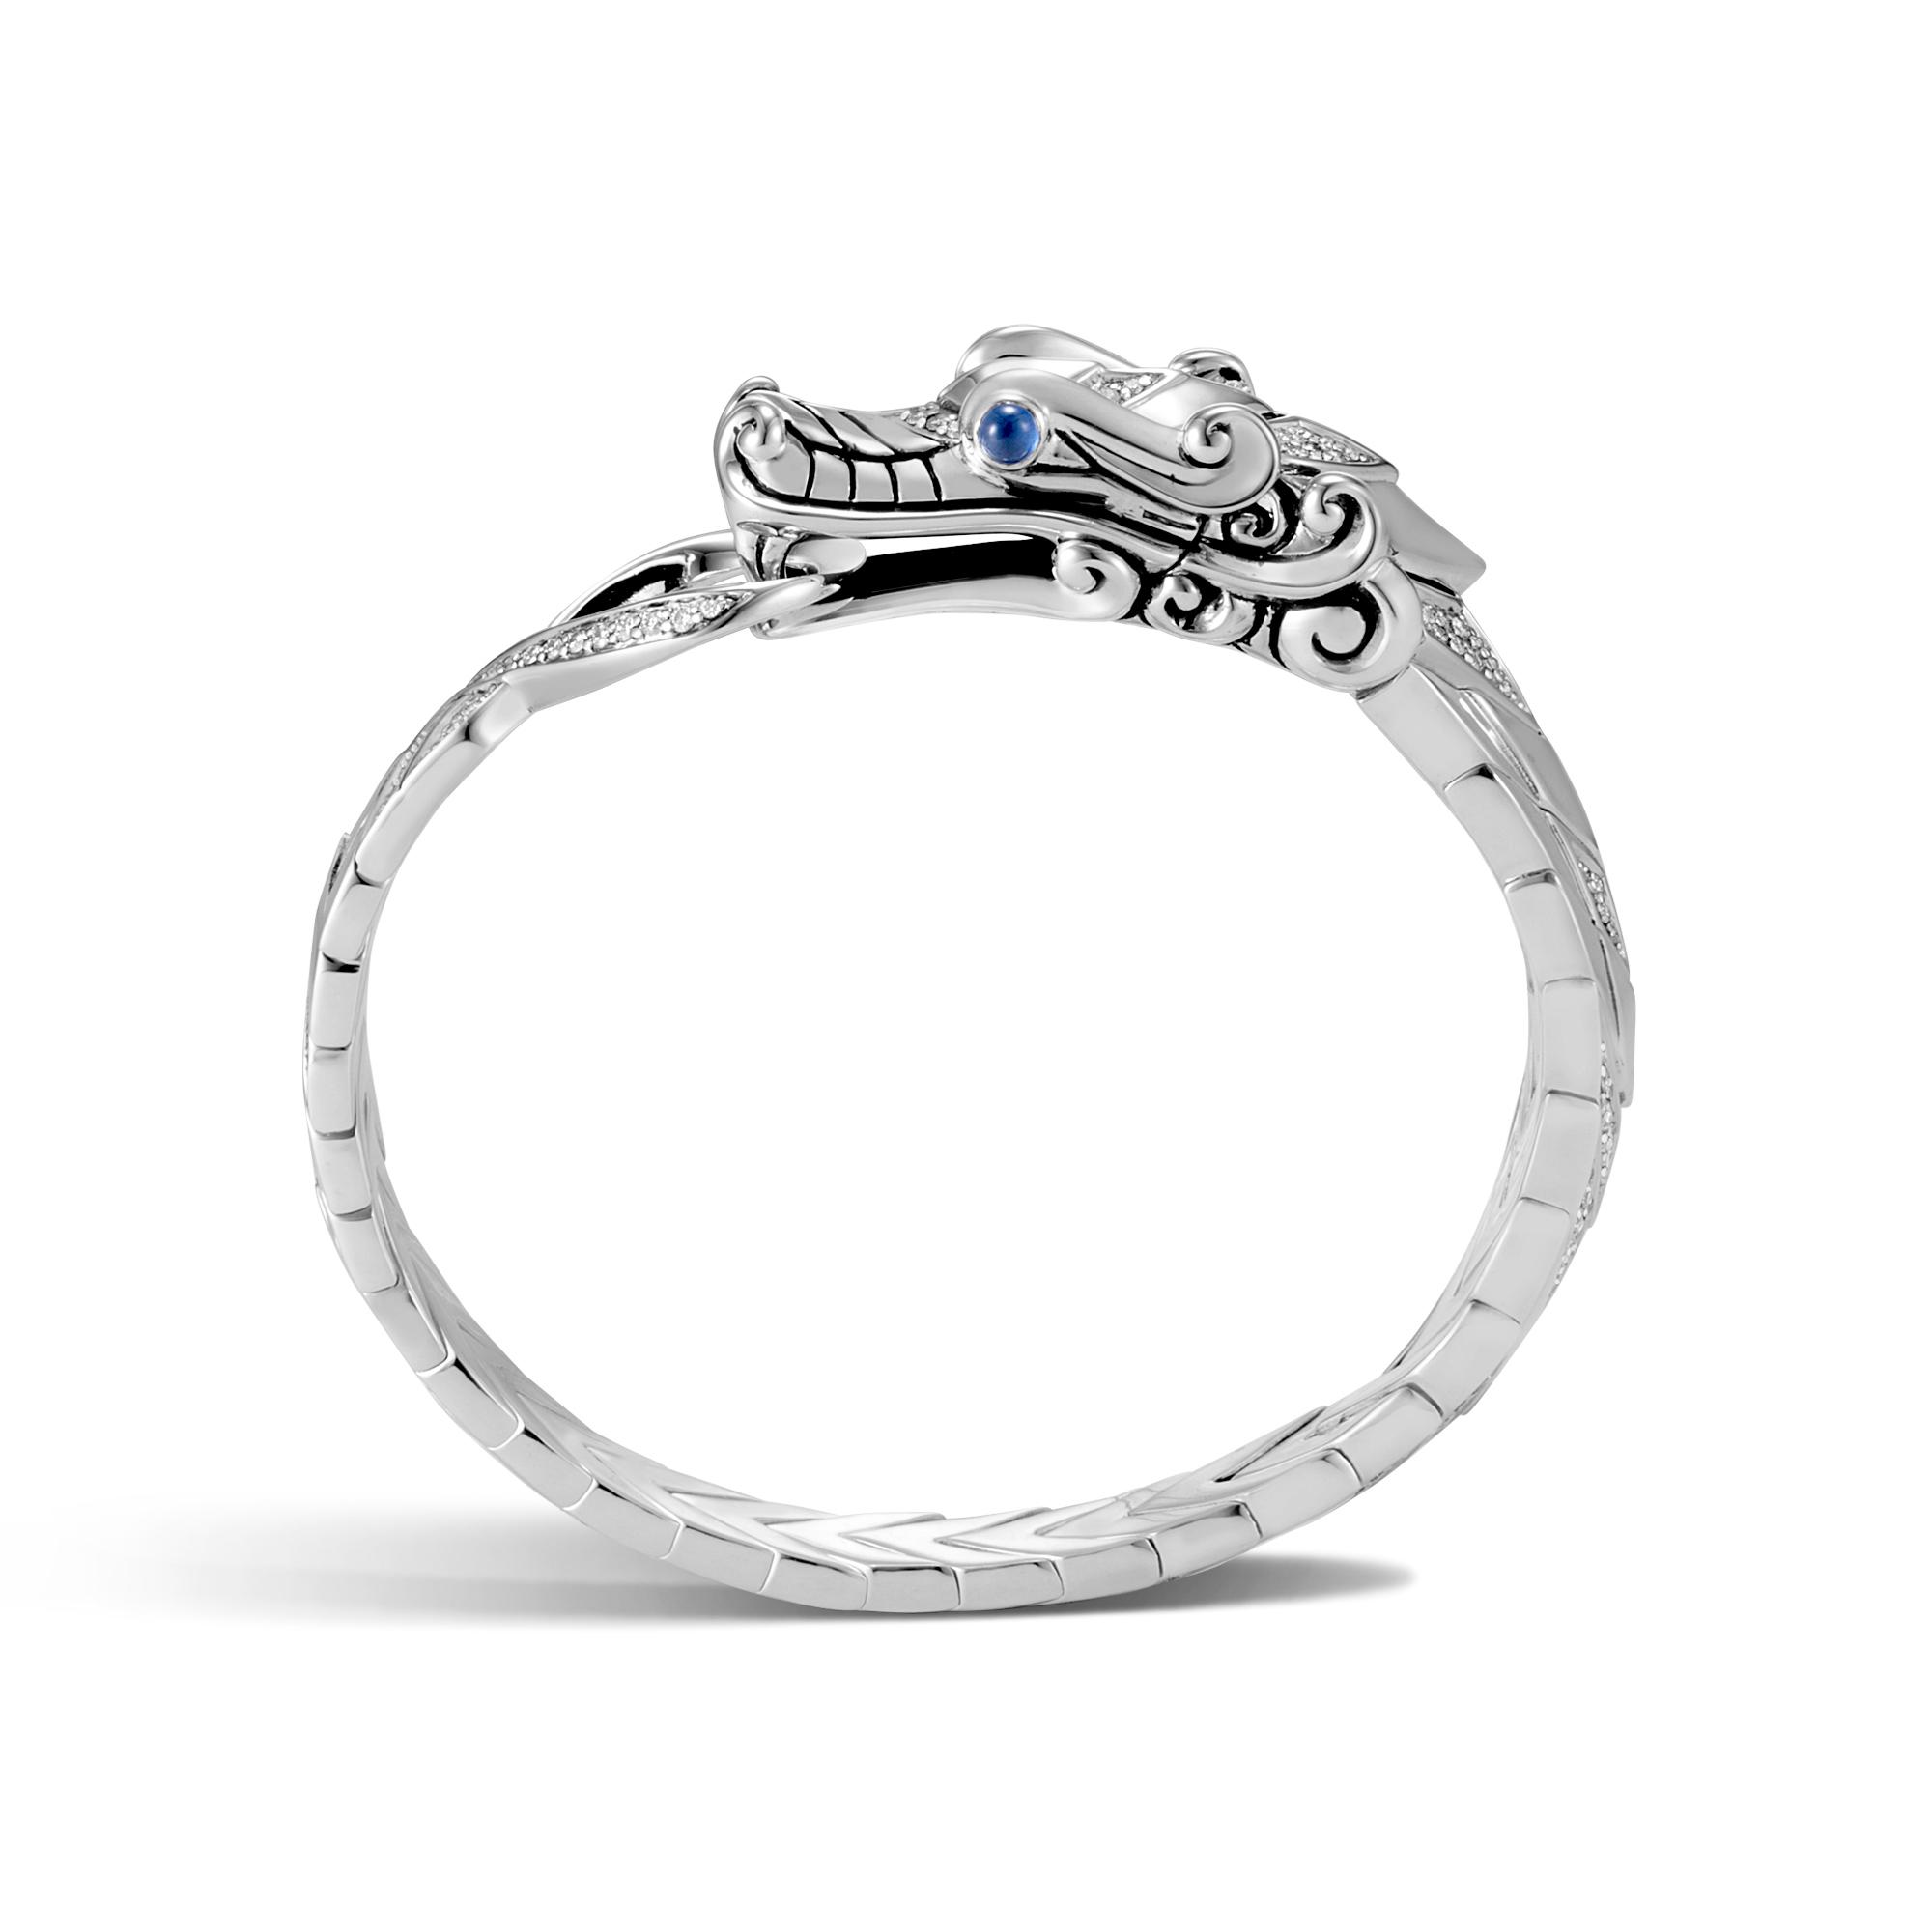 Legends Naga Station Bracelet in Silver with Diamonds, White Diamond, large